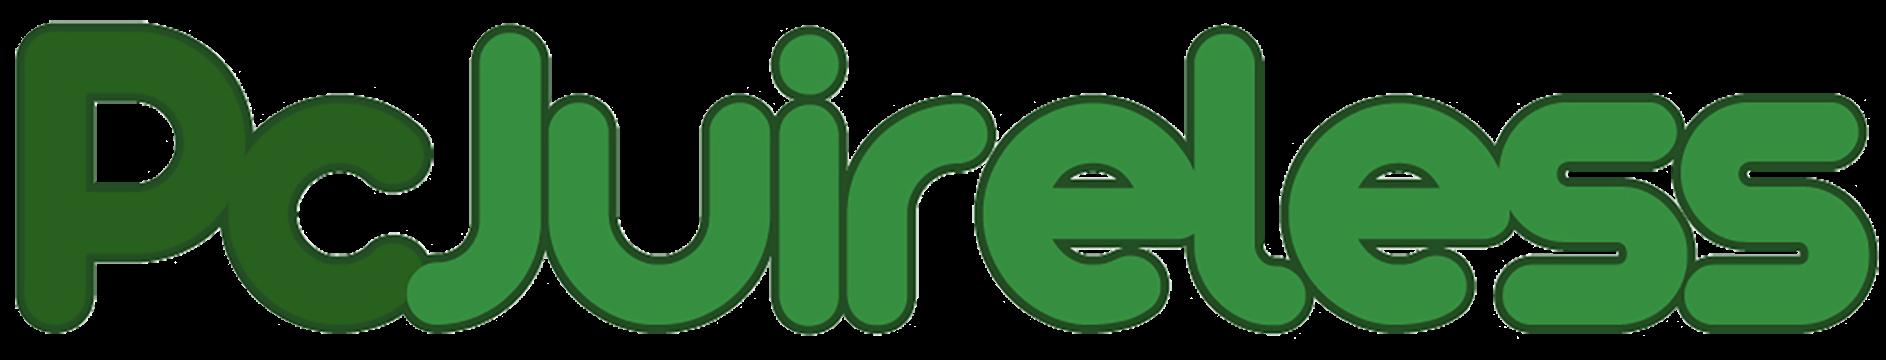 Logo tienda PcJuireless